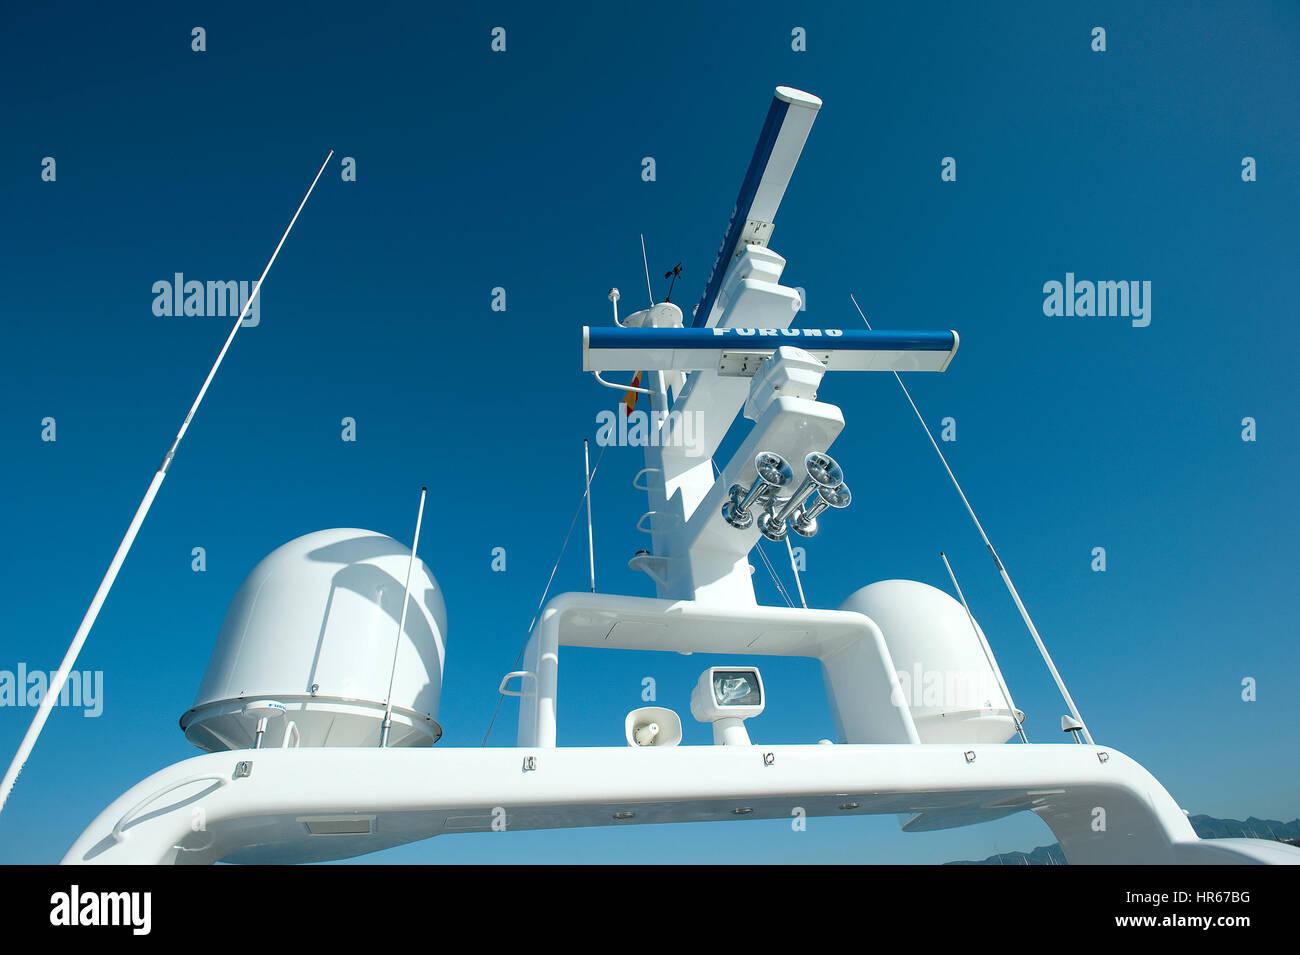 Luxury Yacht navigation and radar - Stock Image